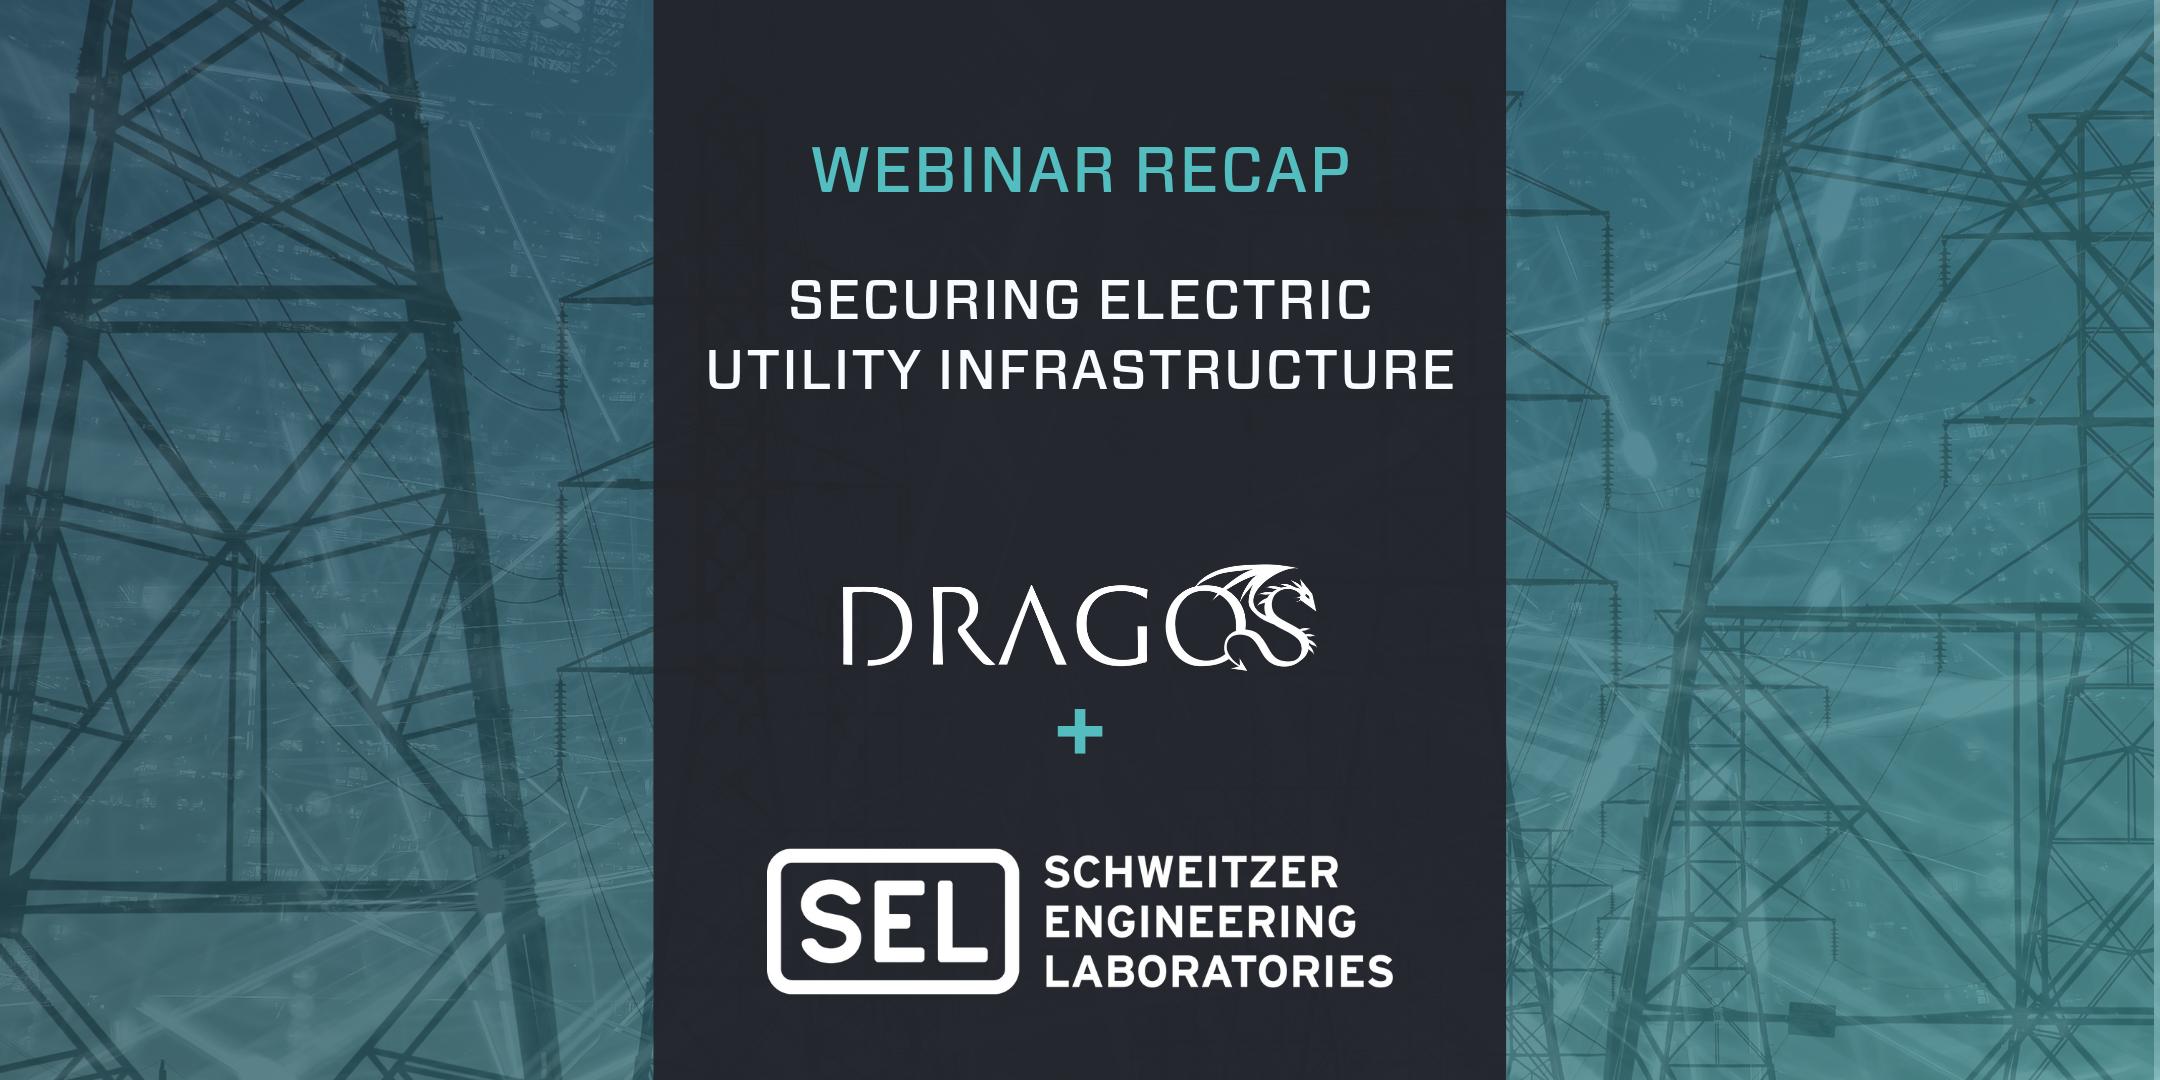 Securing Electric Utility Infrastructure Webinar Recap